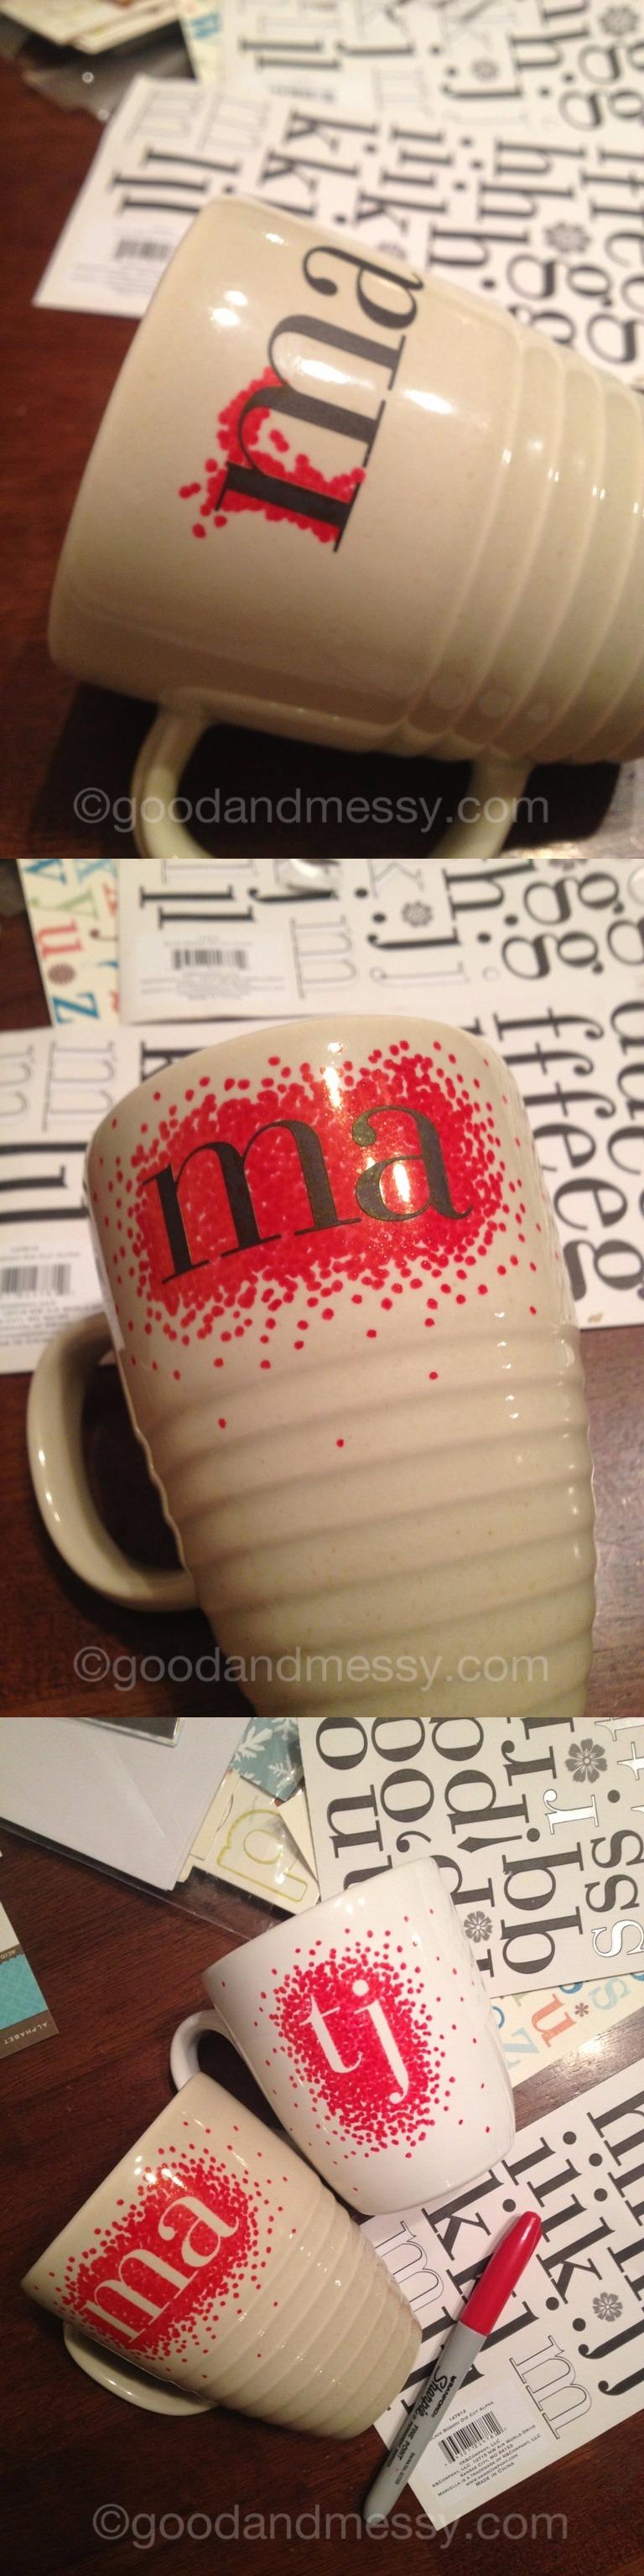 DIY Monogrammed Sharpie Mug